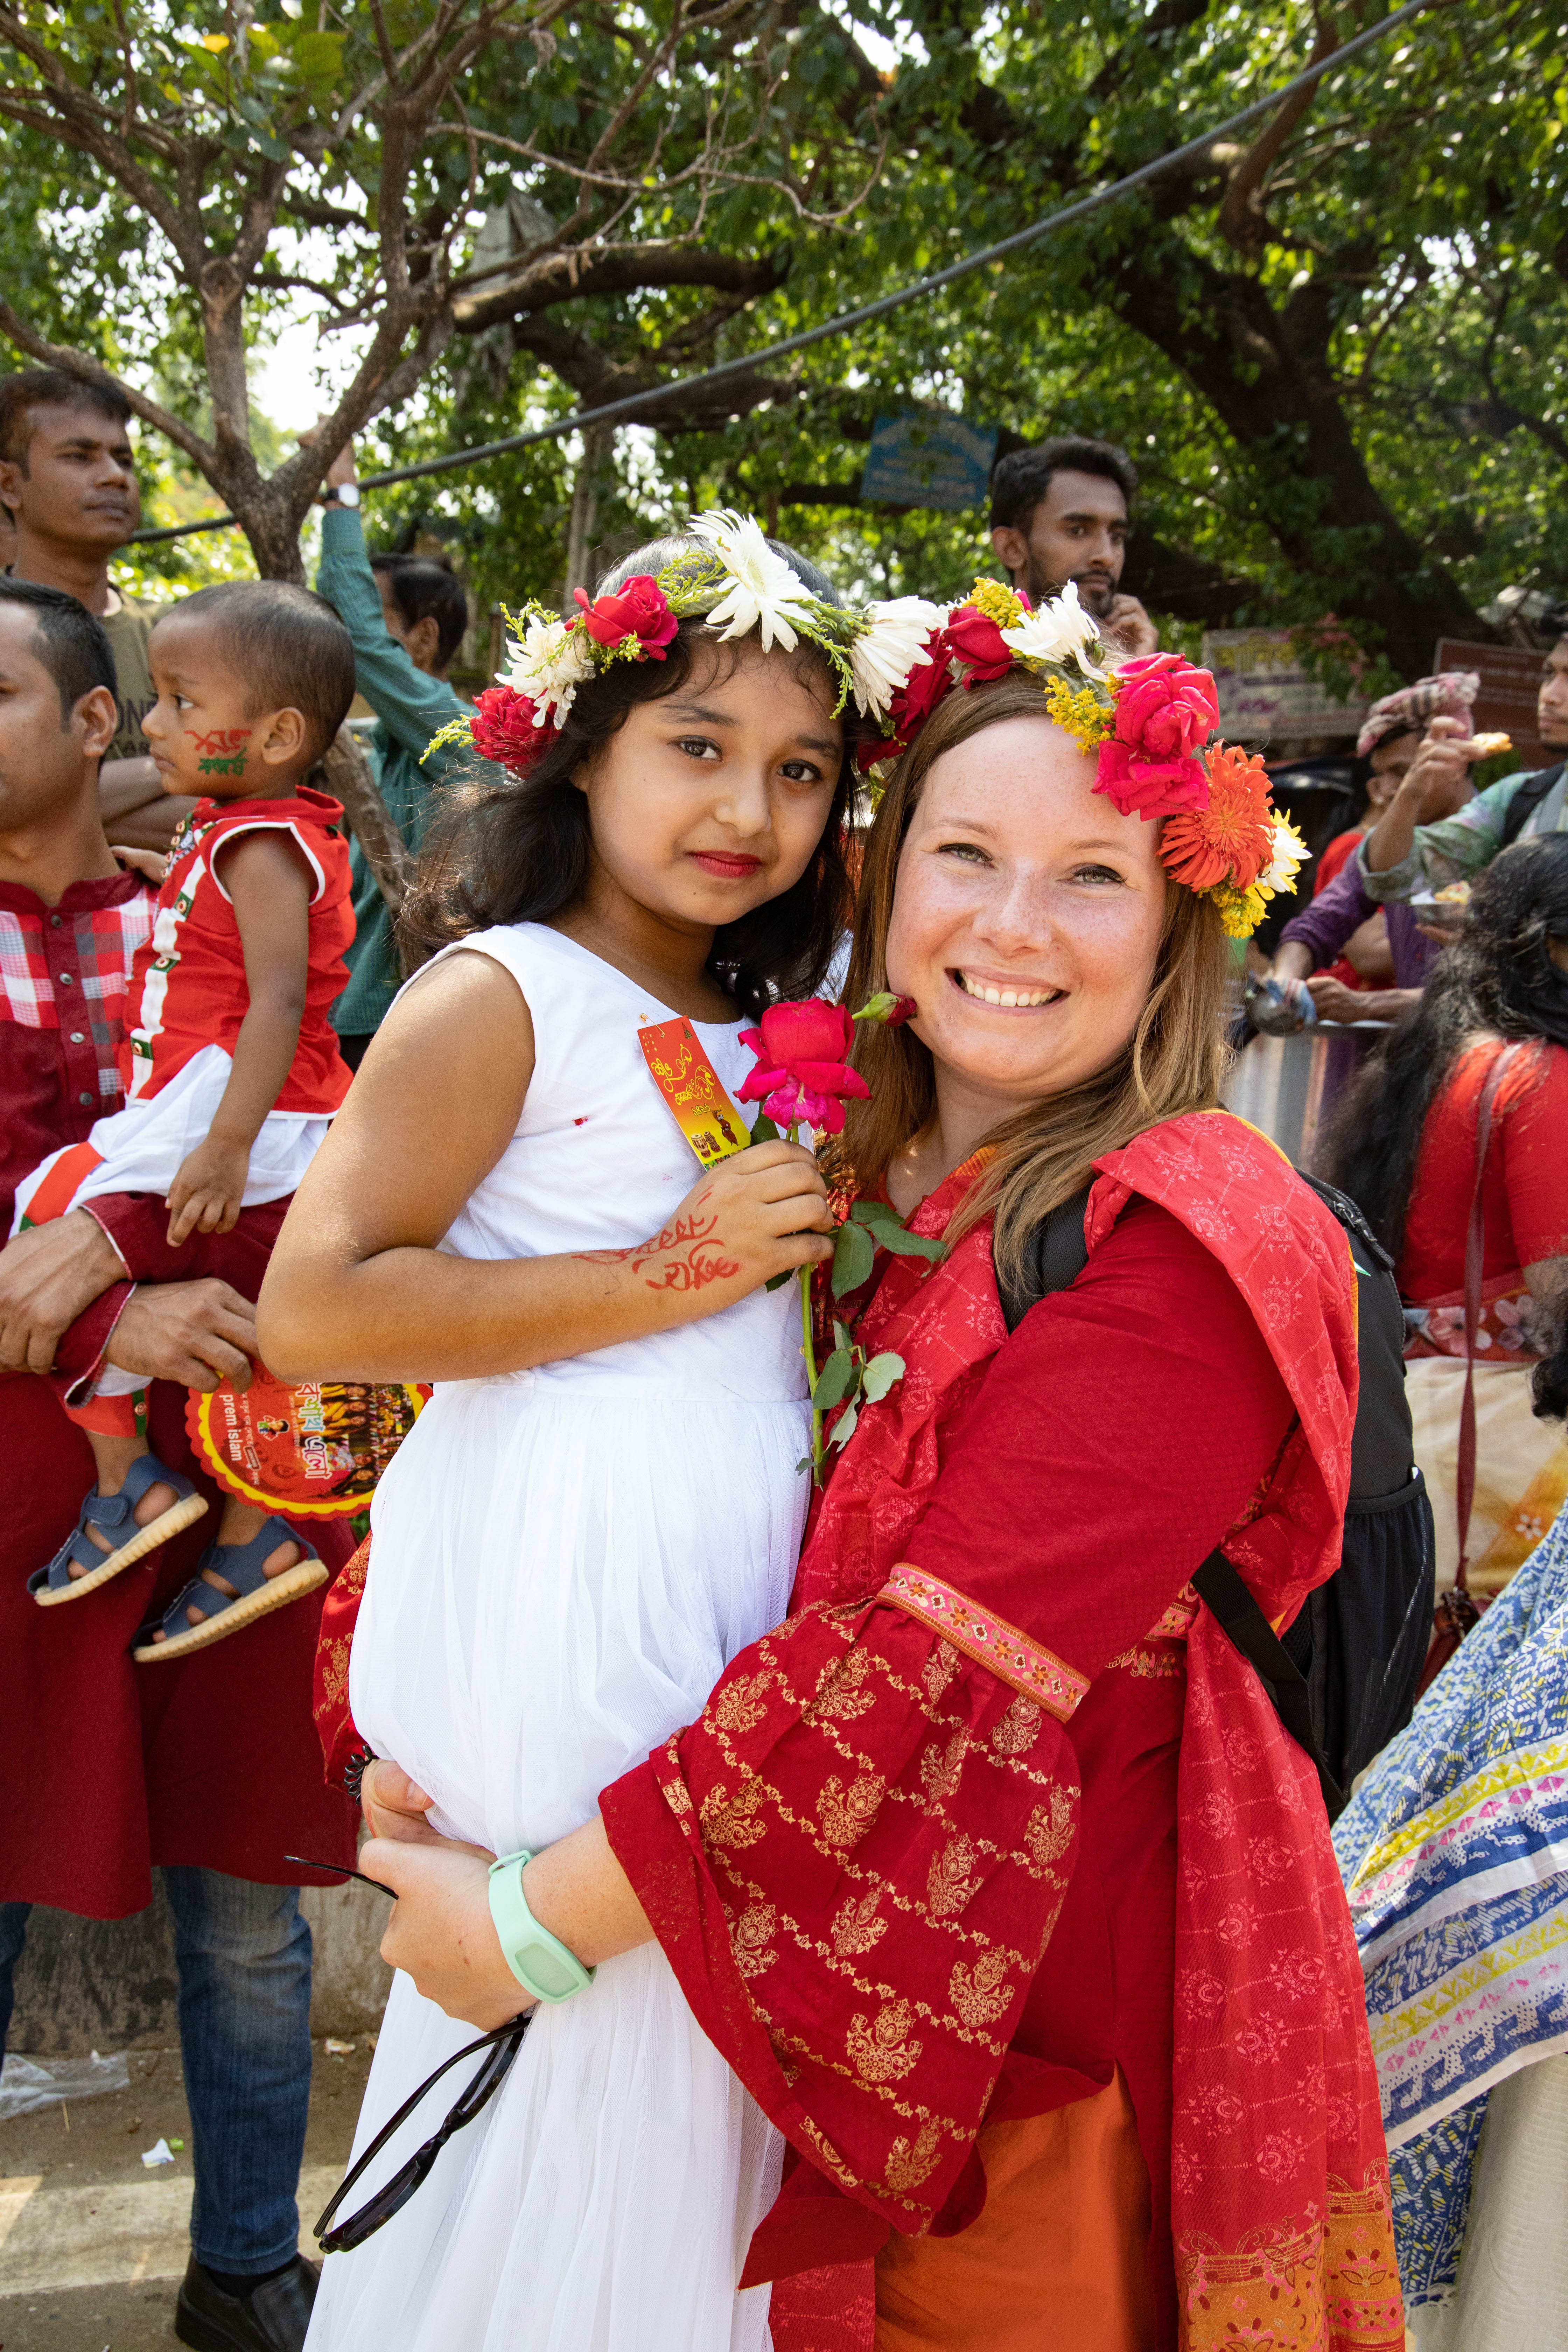 Bengaals Nieuwjaar - Traditionele kledij - Dhaka, Bangladesh